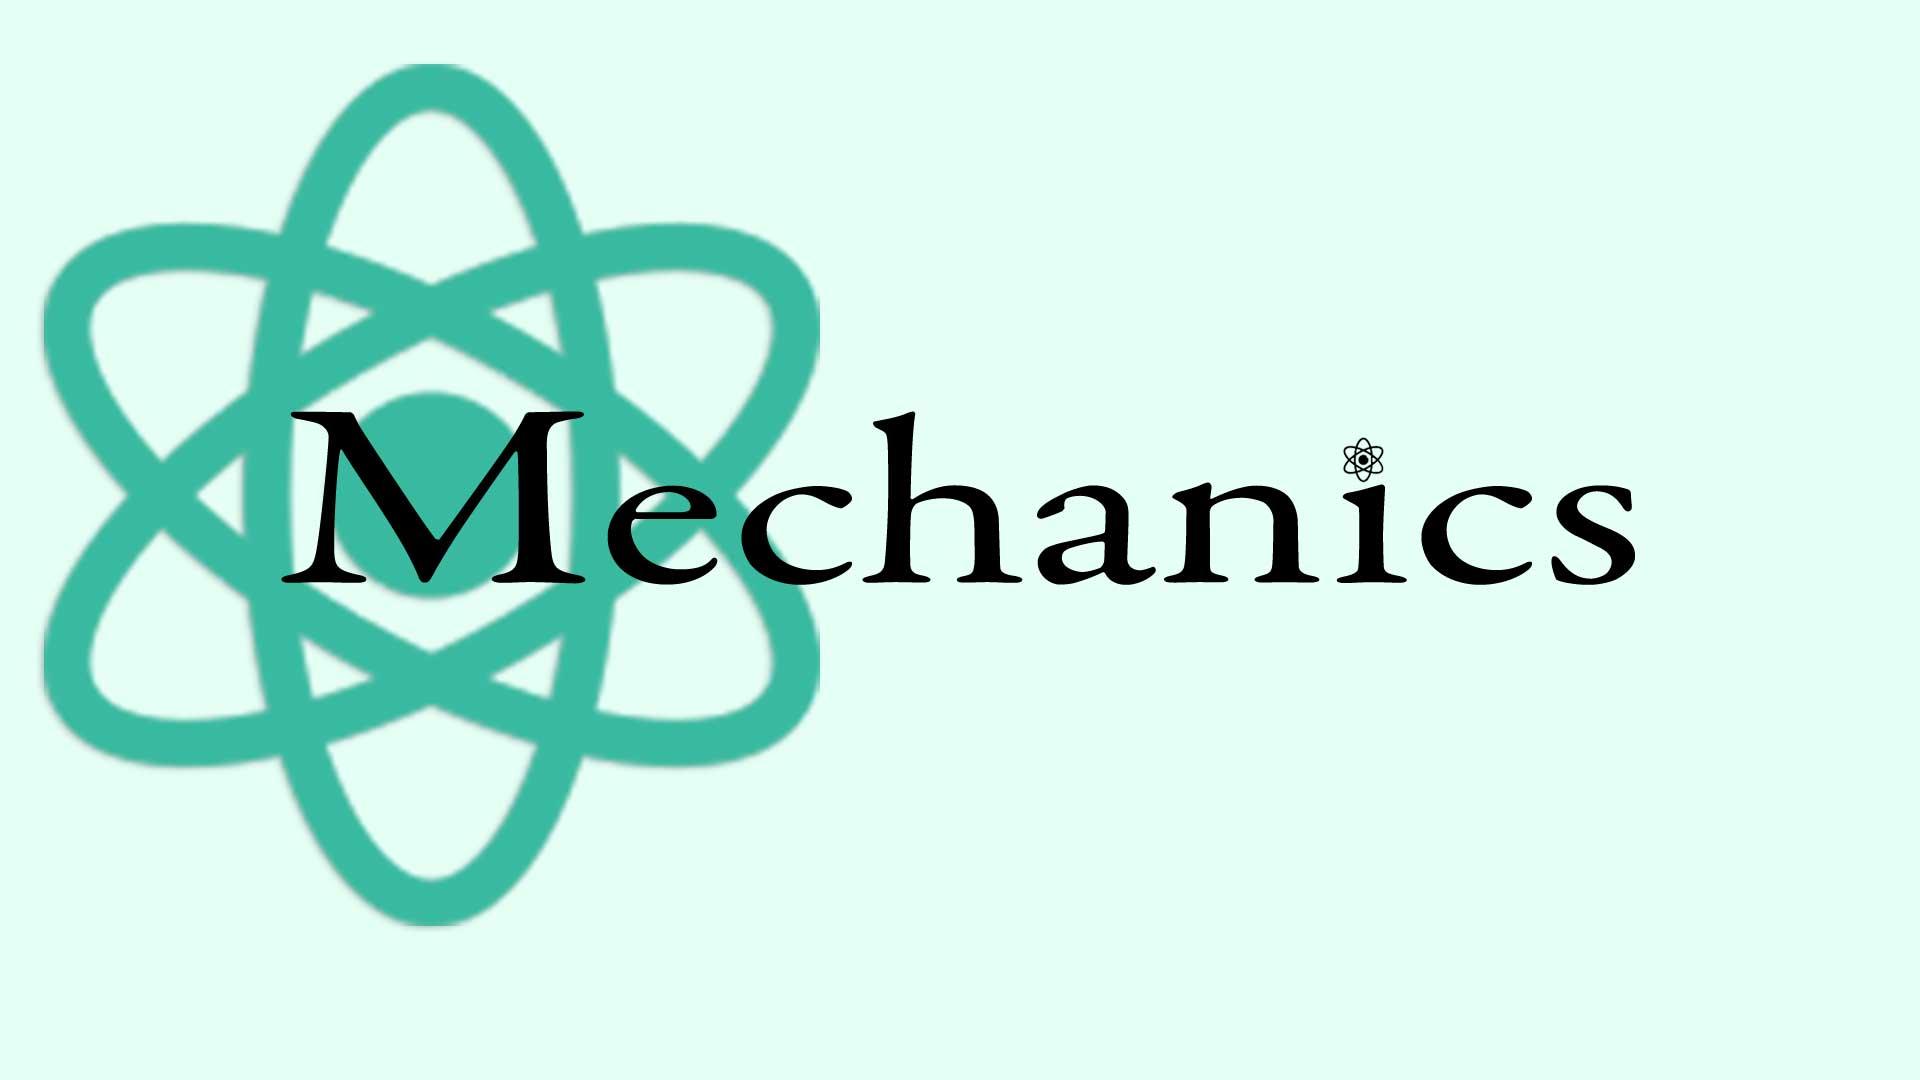 Mechanics Graphic with Atom